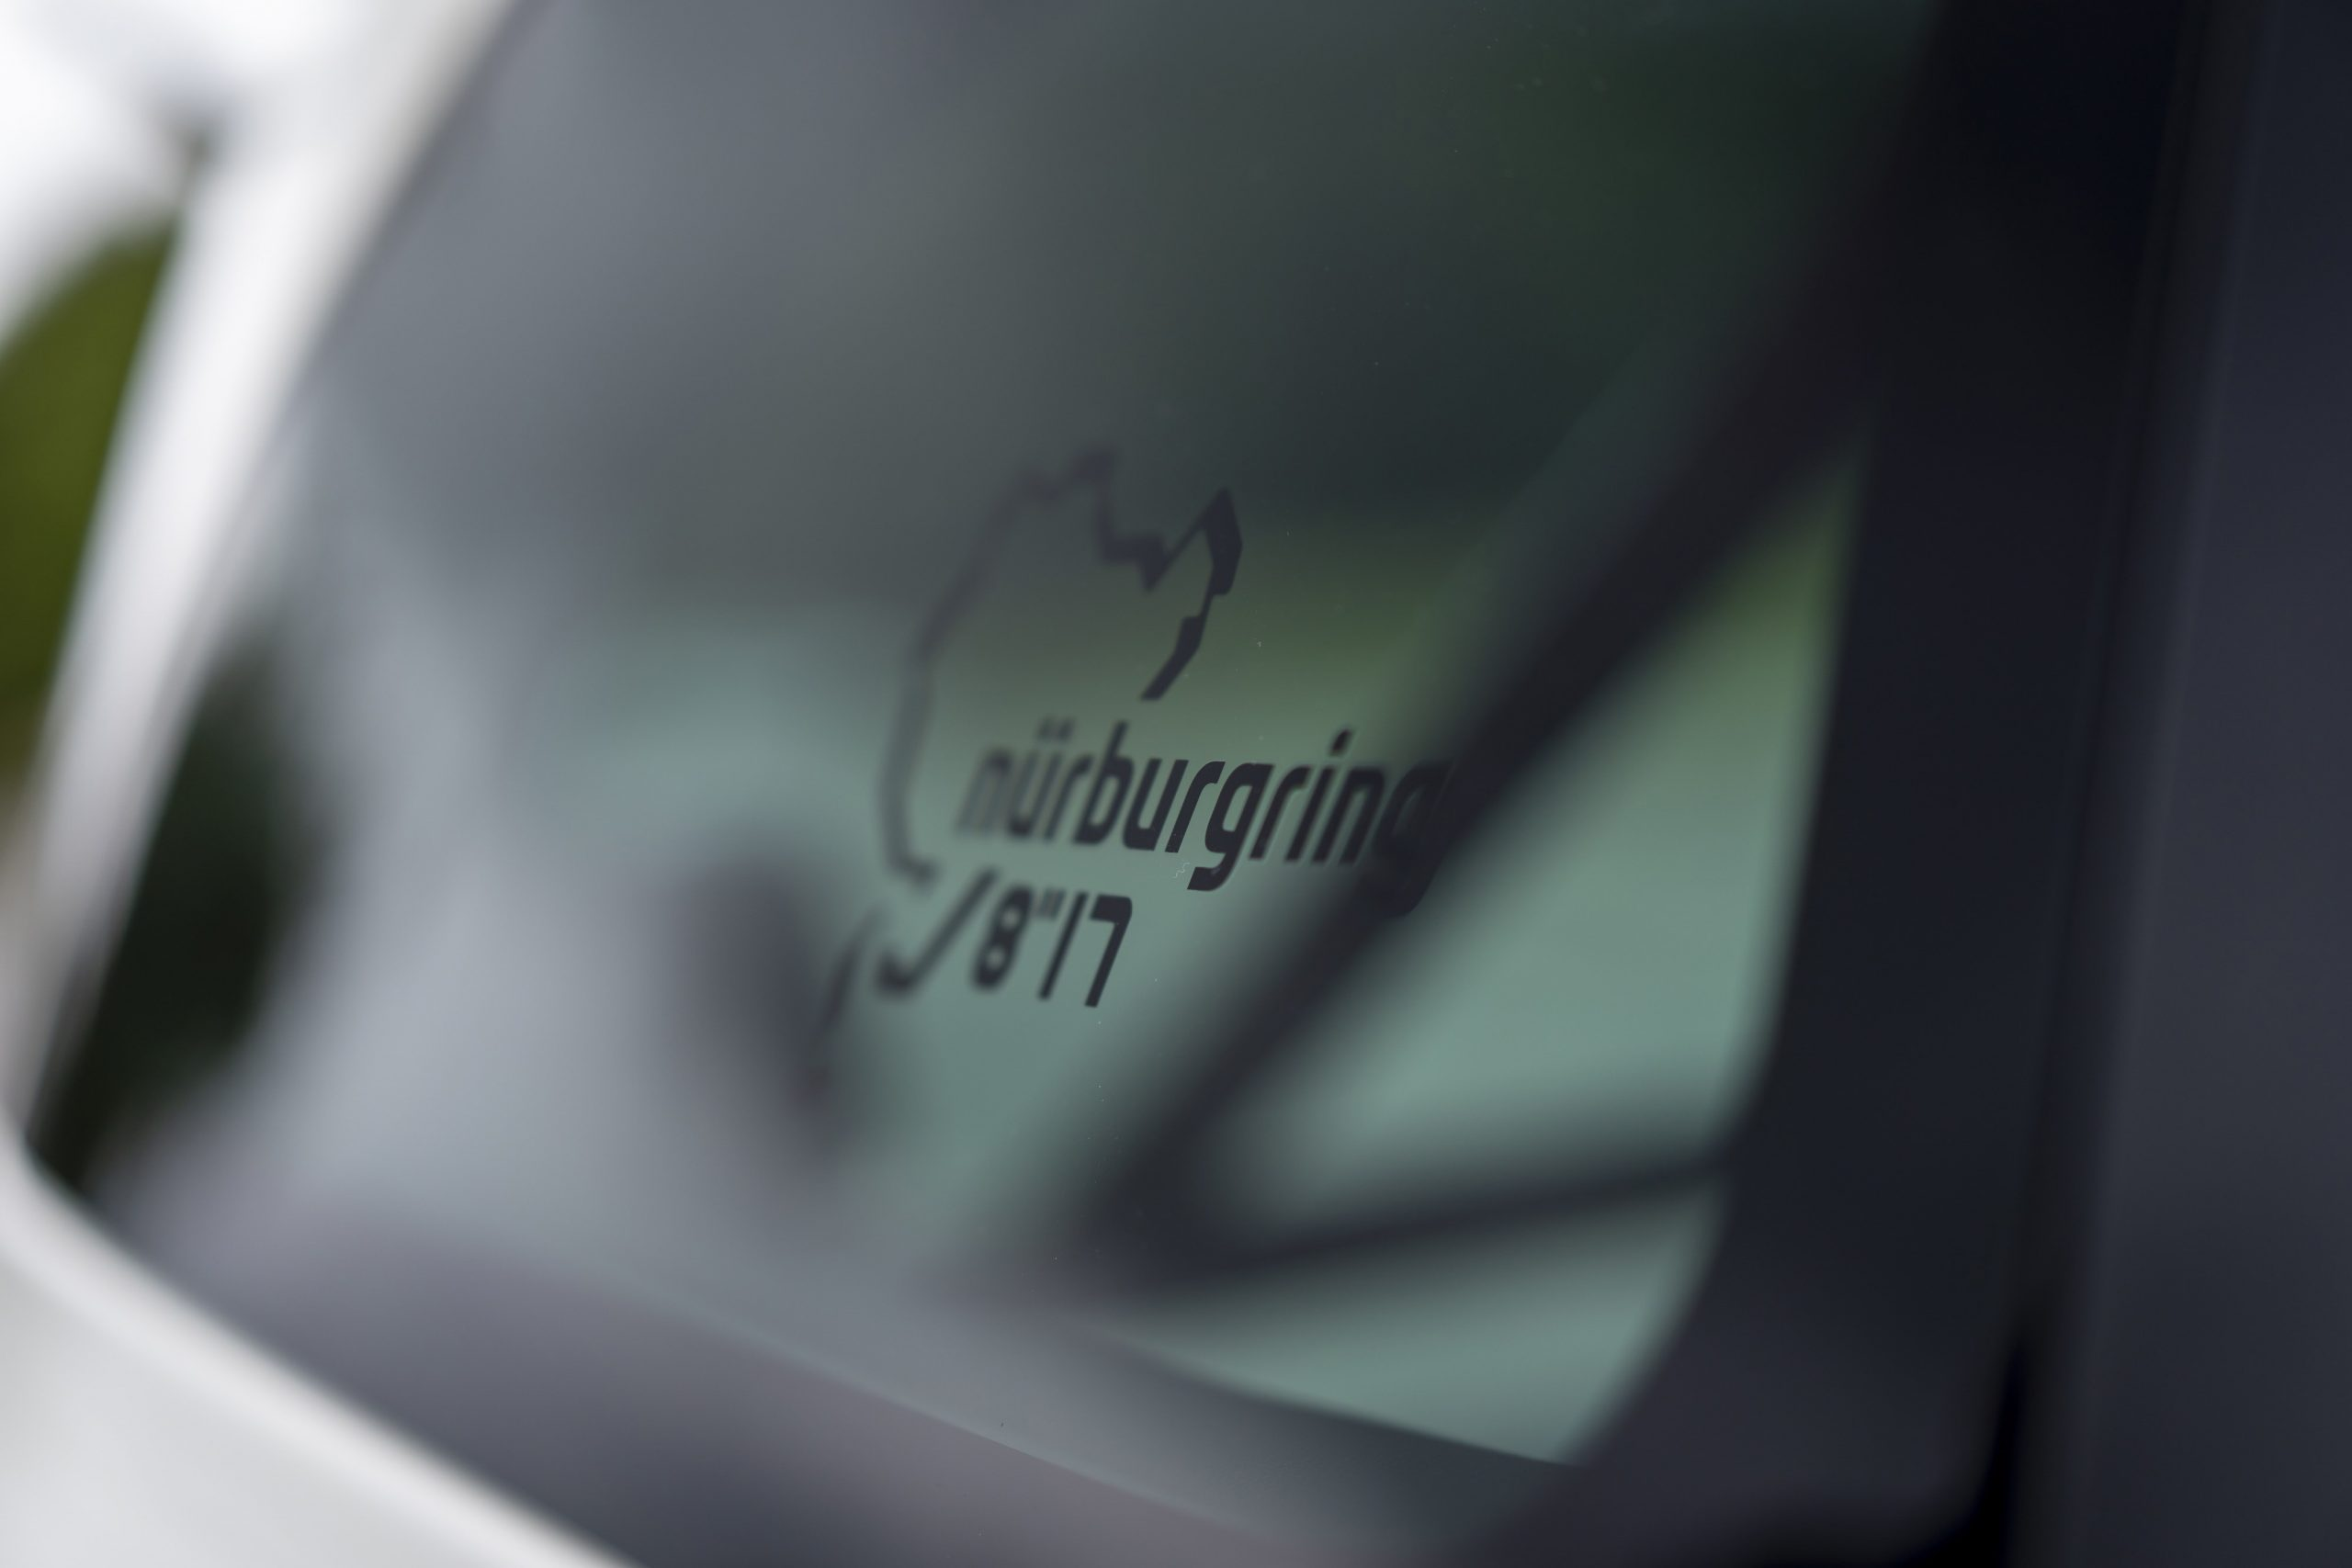 renault megane r26r nurburgring decal